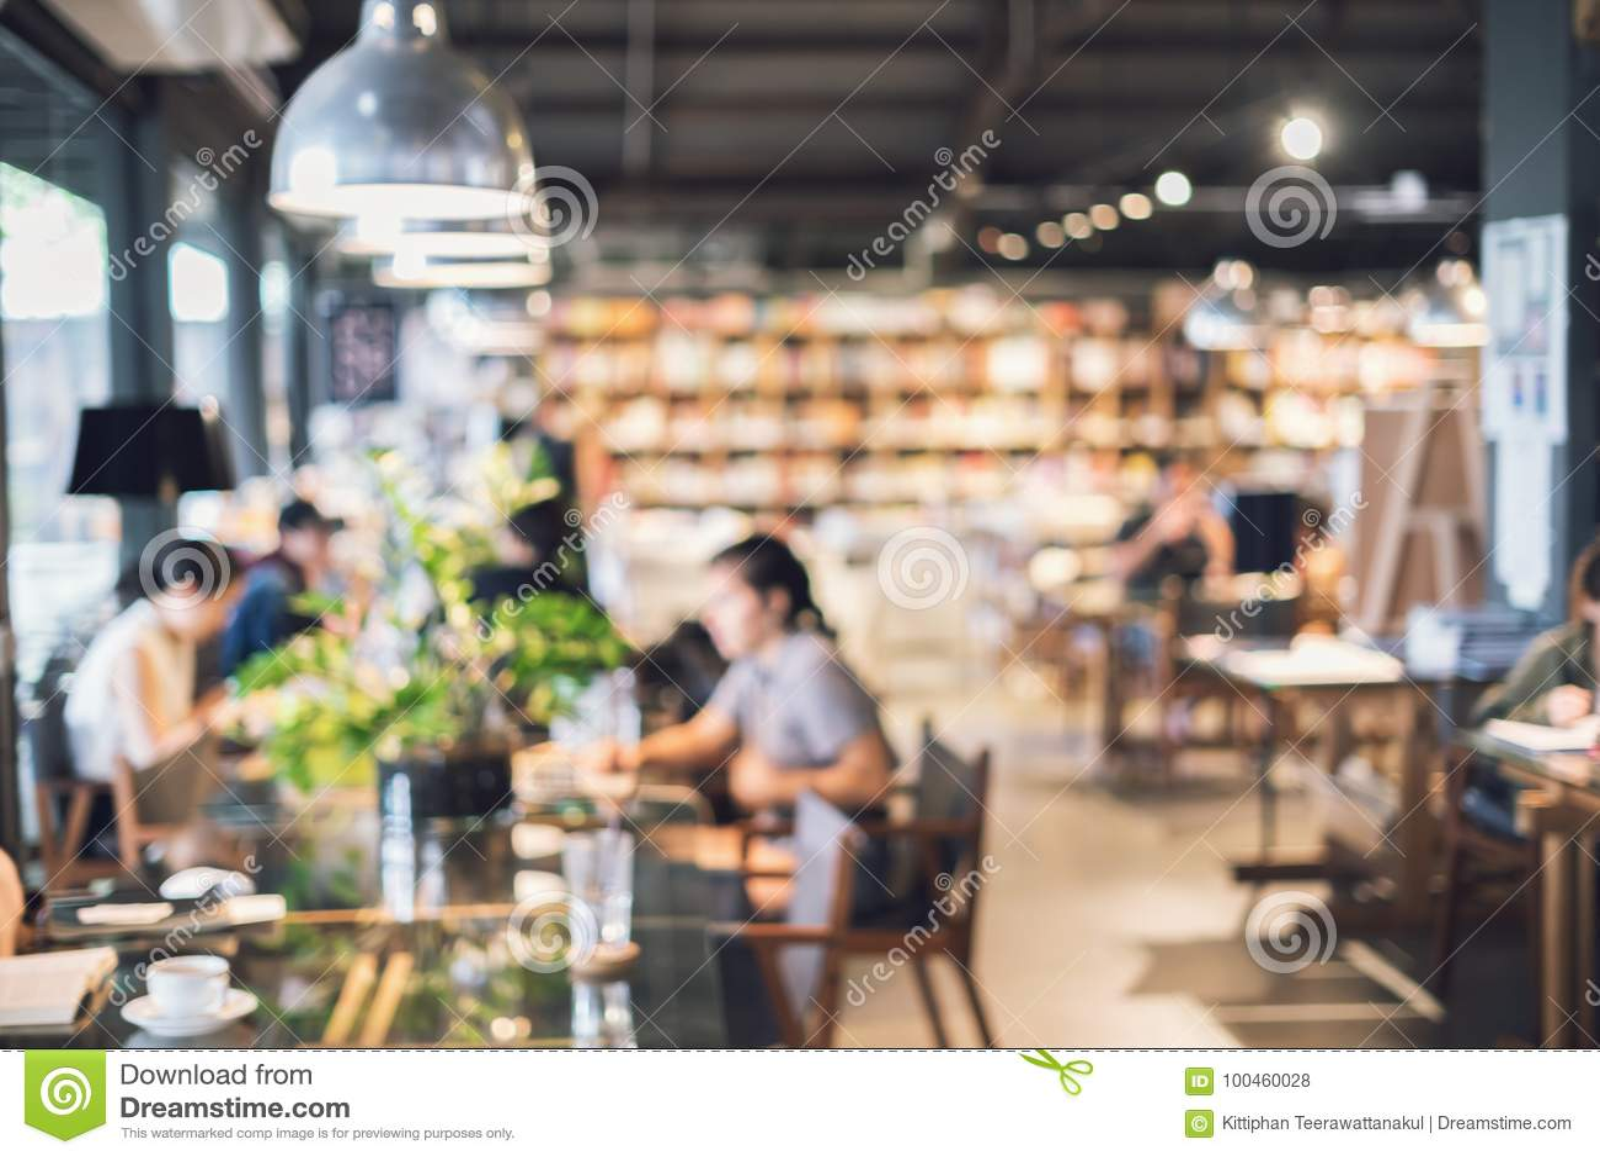 Abstract blurry defocused image of restaurant interior, Vintage